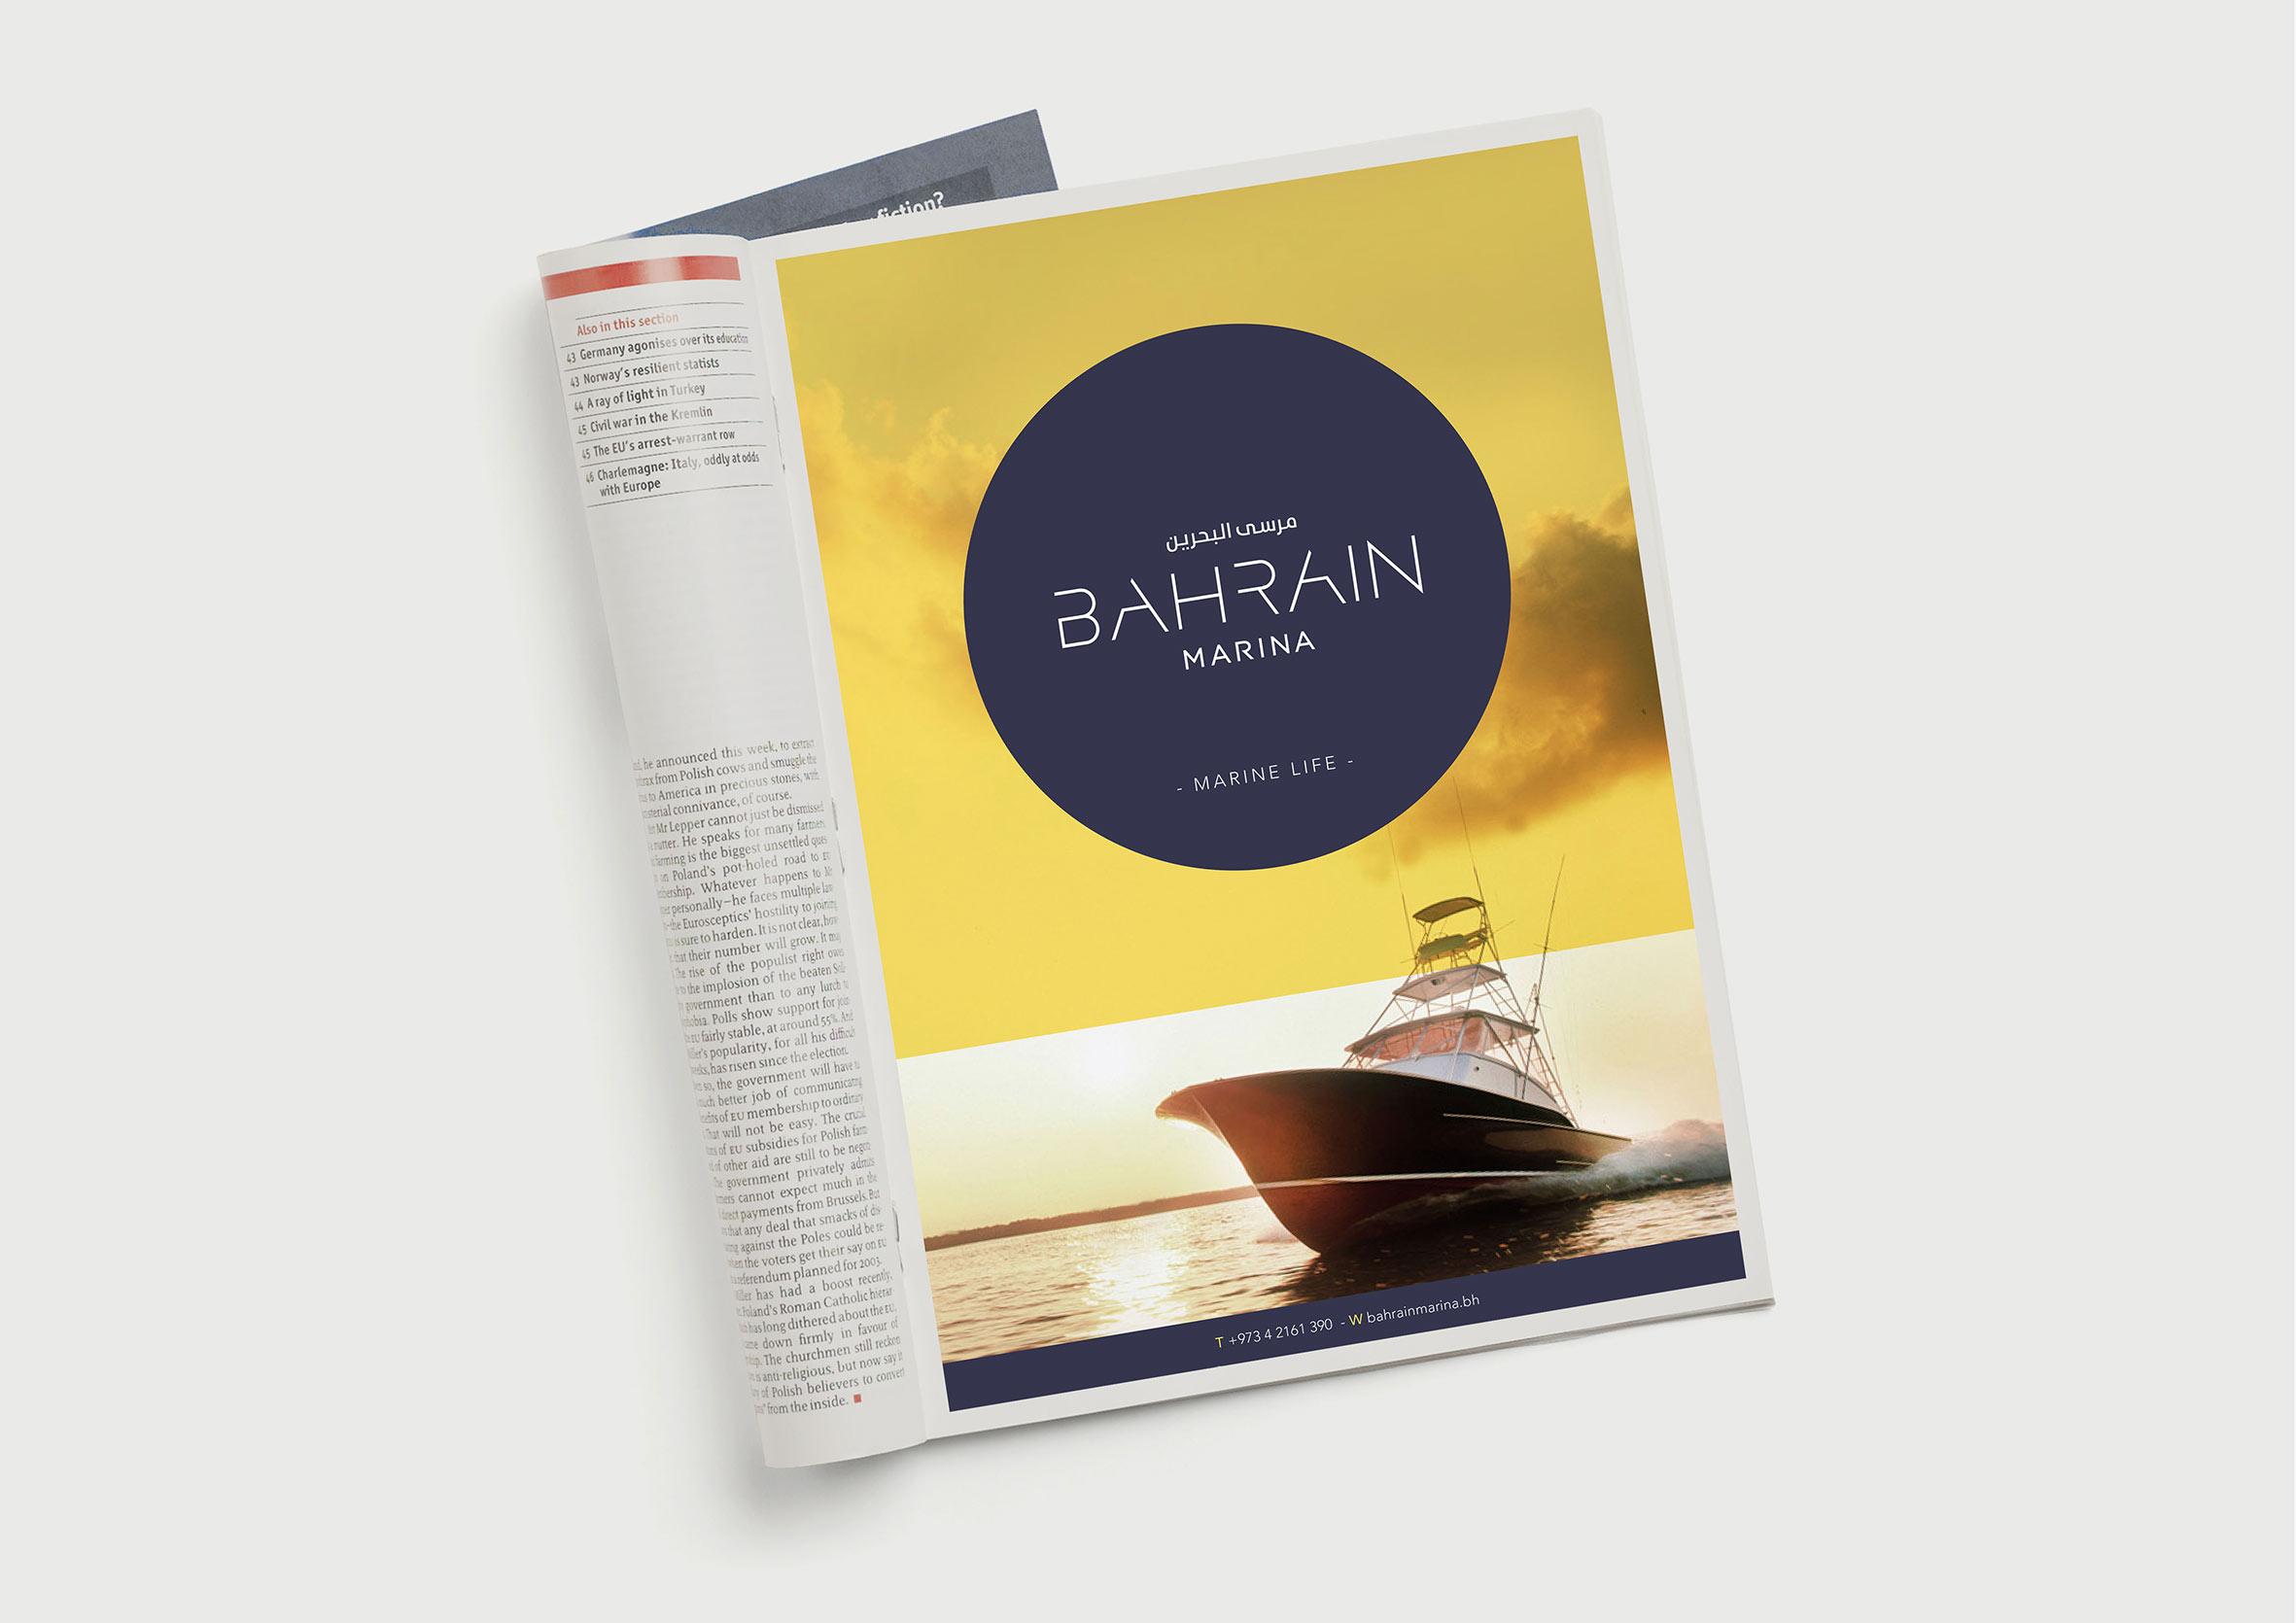 Bahrain-marina-identite-branding-publicite-magazine.jpg